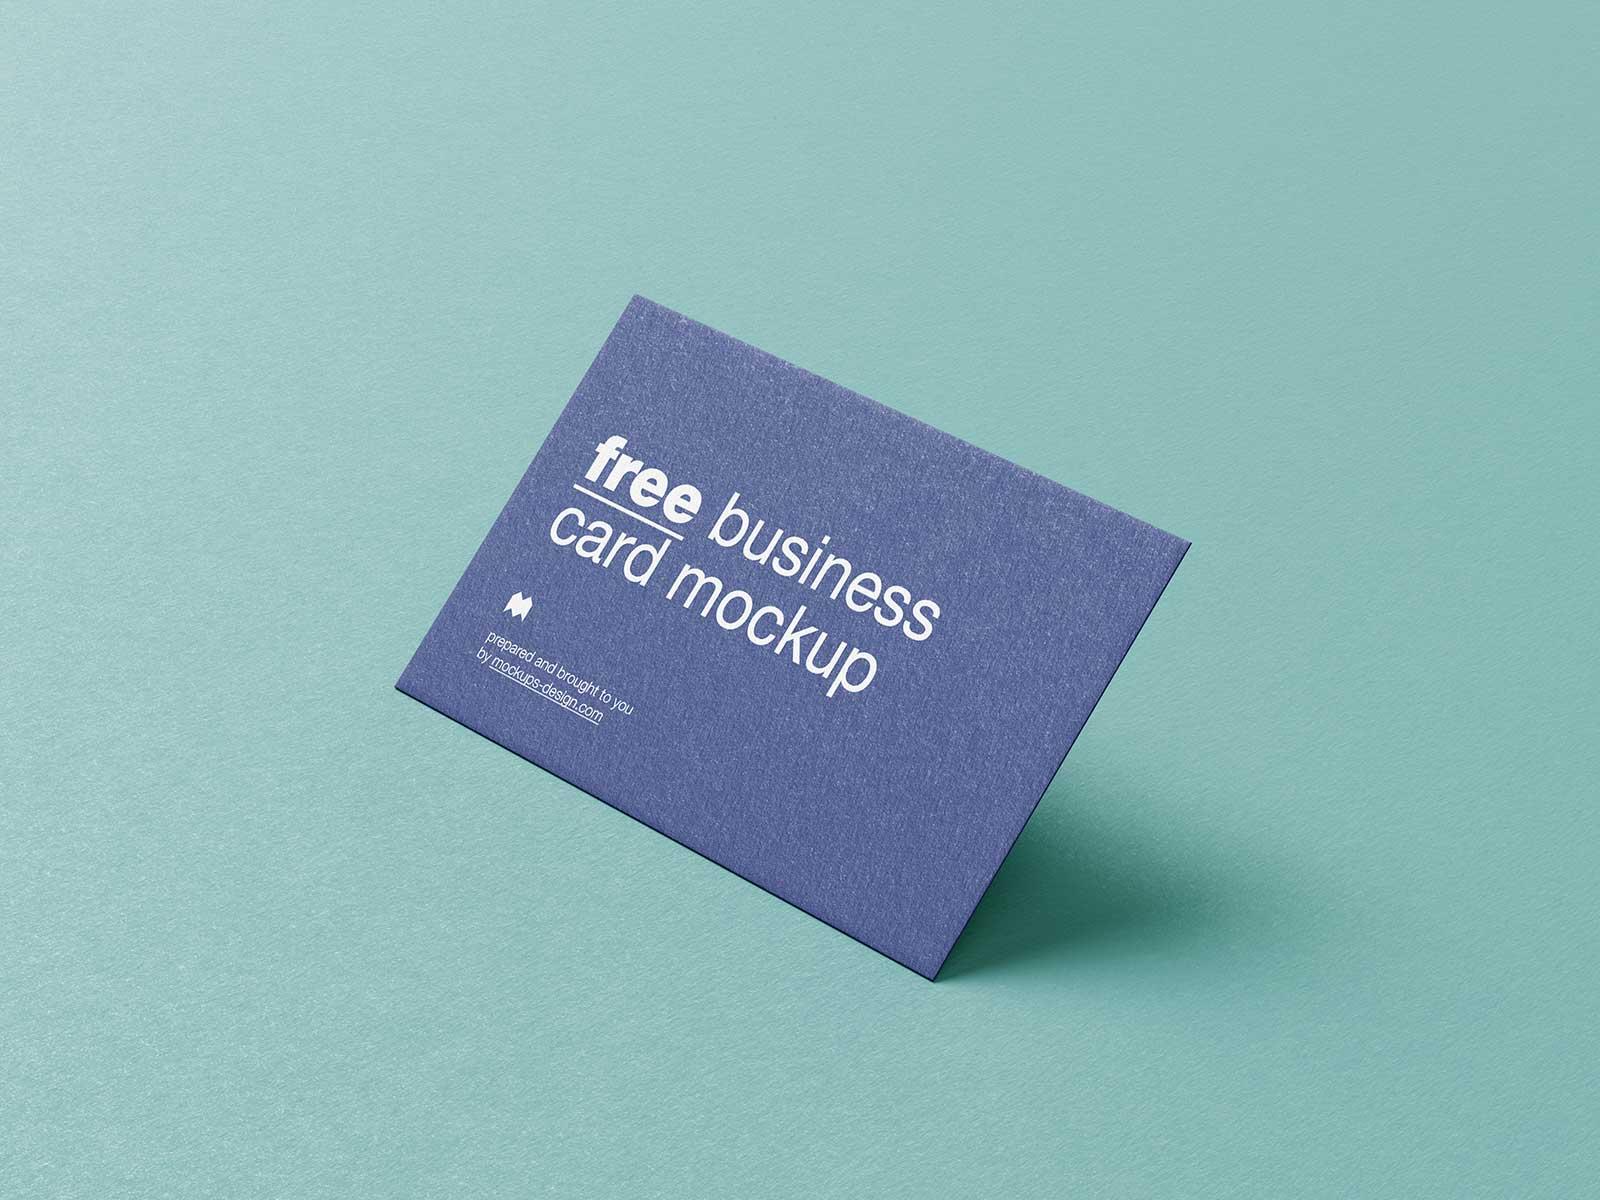 Free Textured Business Card Mockup PSD Set (1)